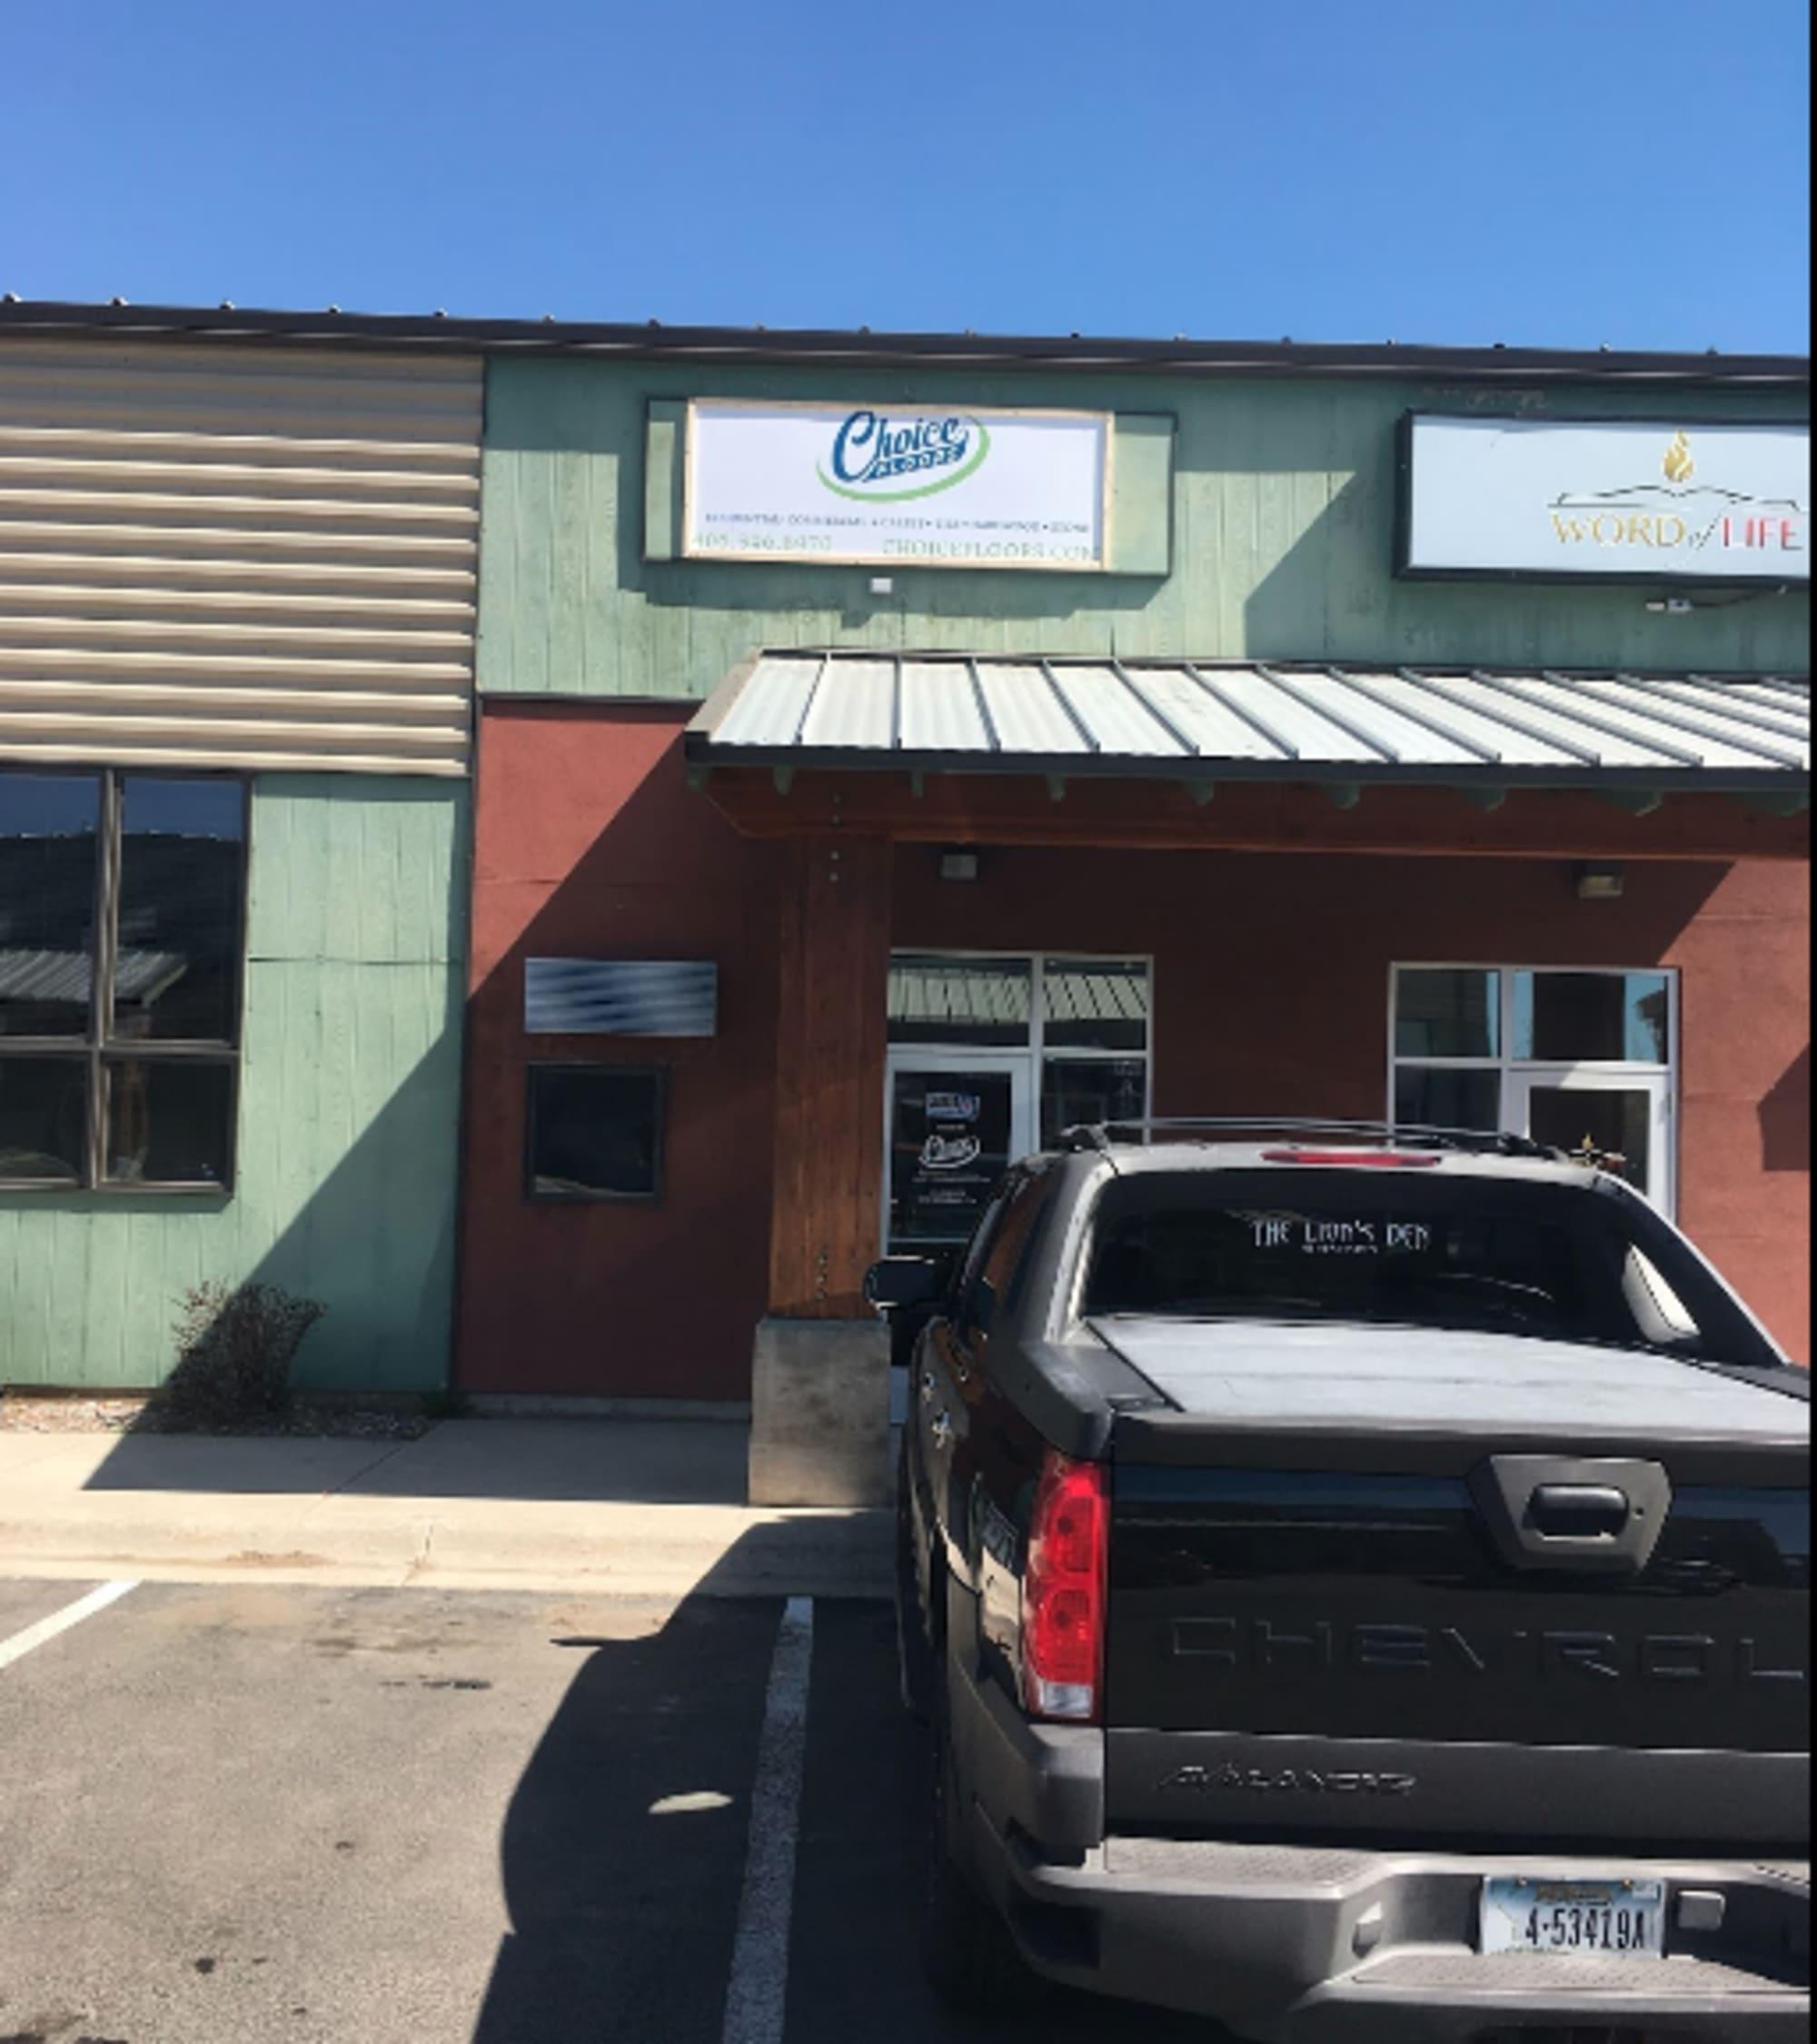 Choice Floors - 2825 Stockyard Rd Missoula, MT 59808